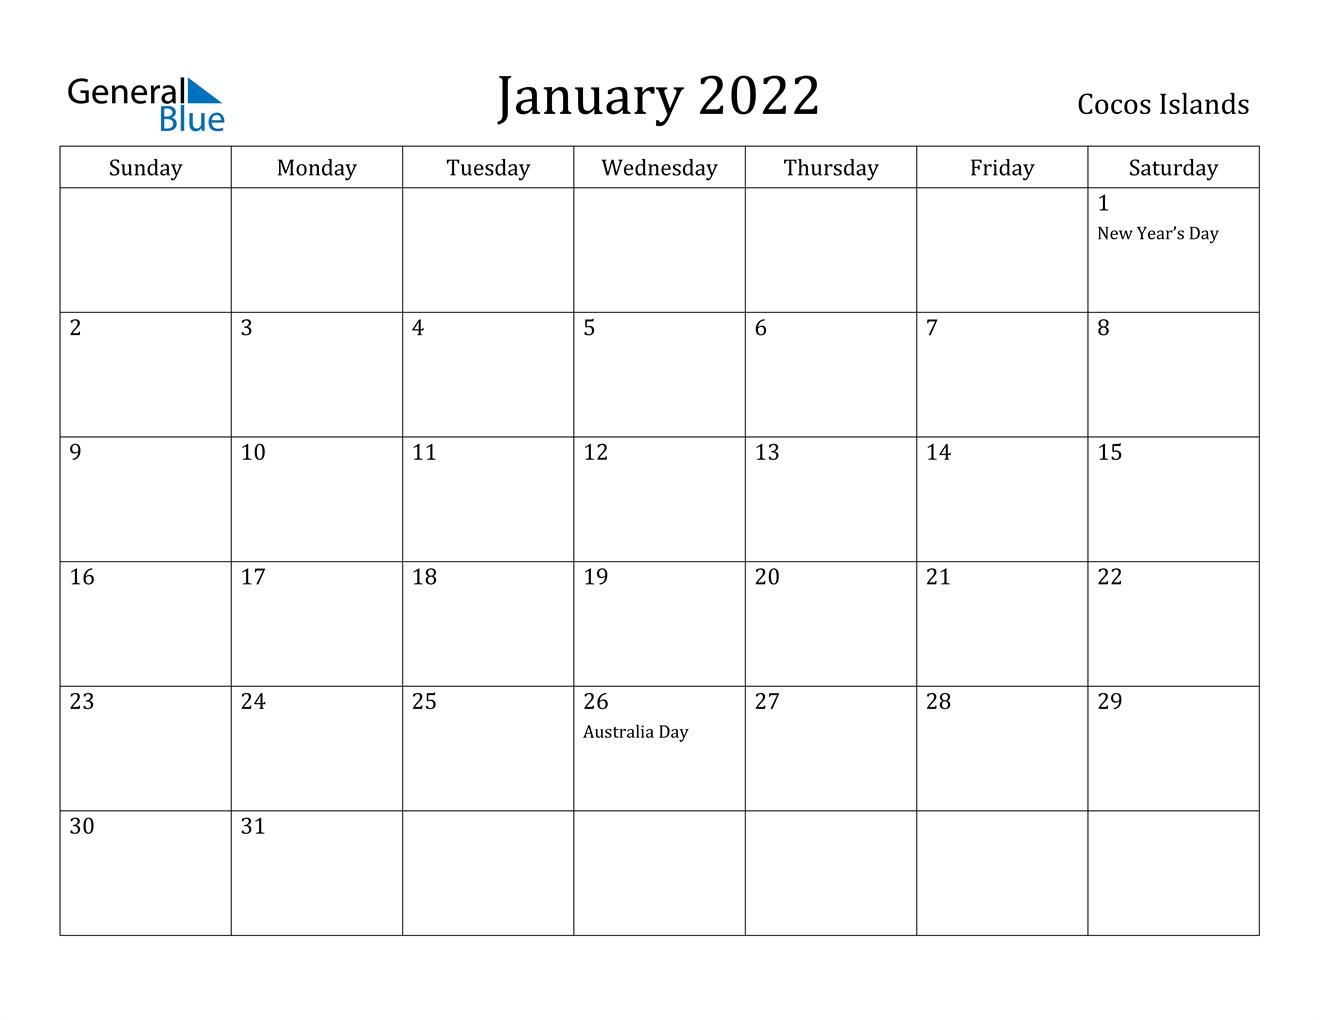 January 2022 Calendar - Cocos Islands for Printable Calendar October 2022 To January 2022